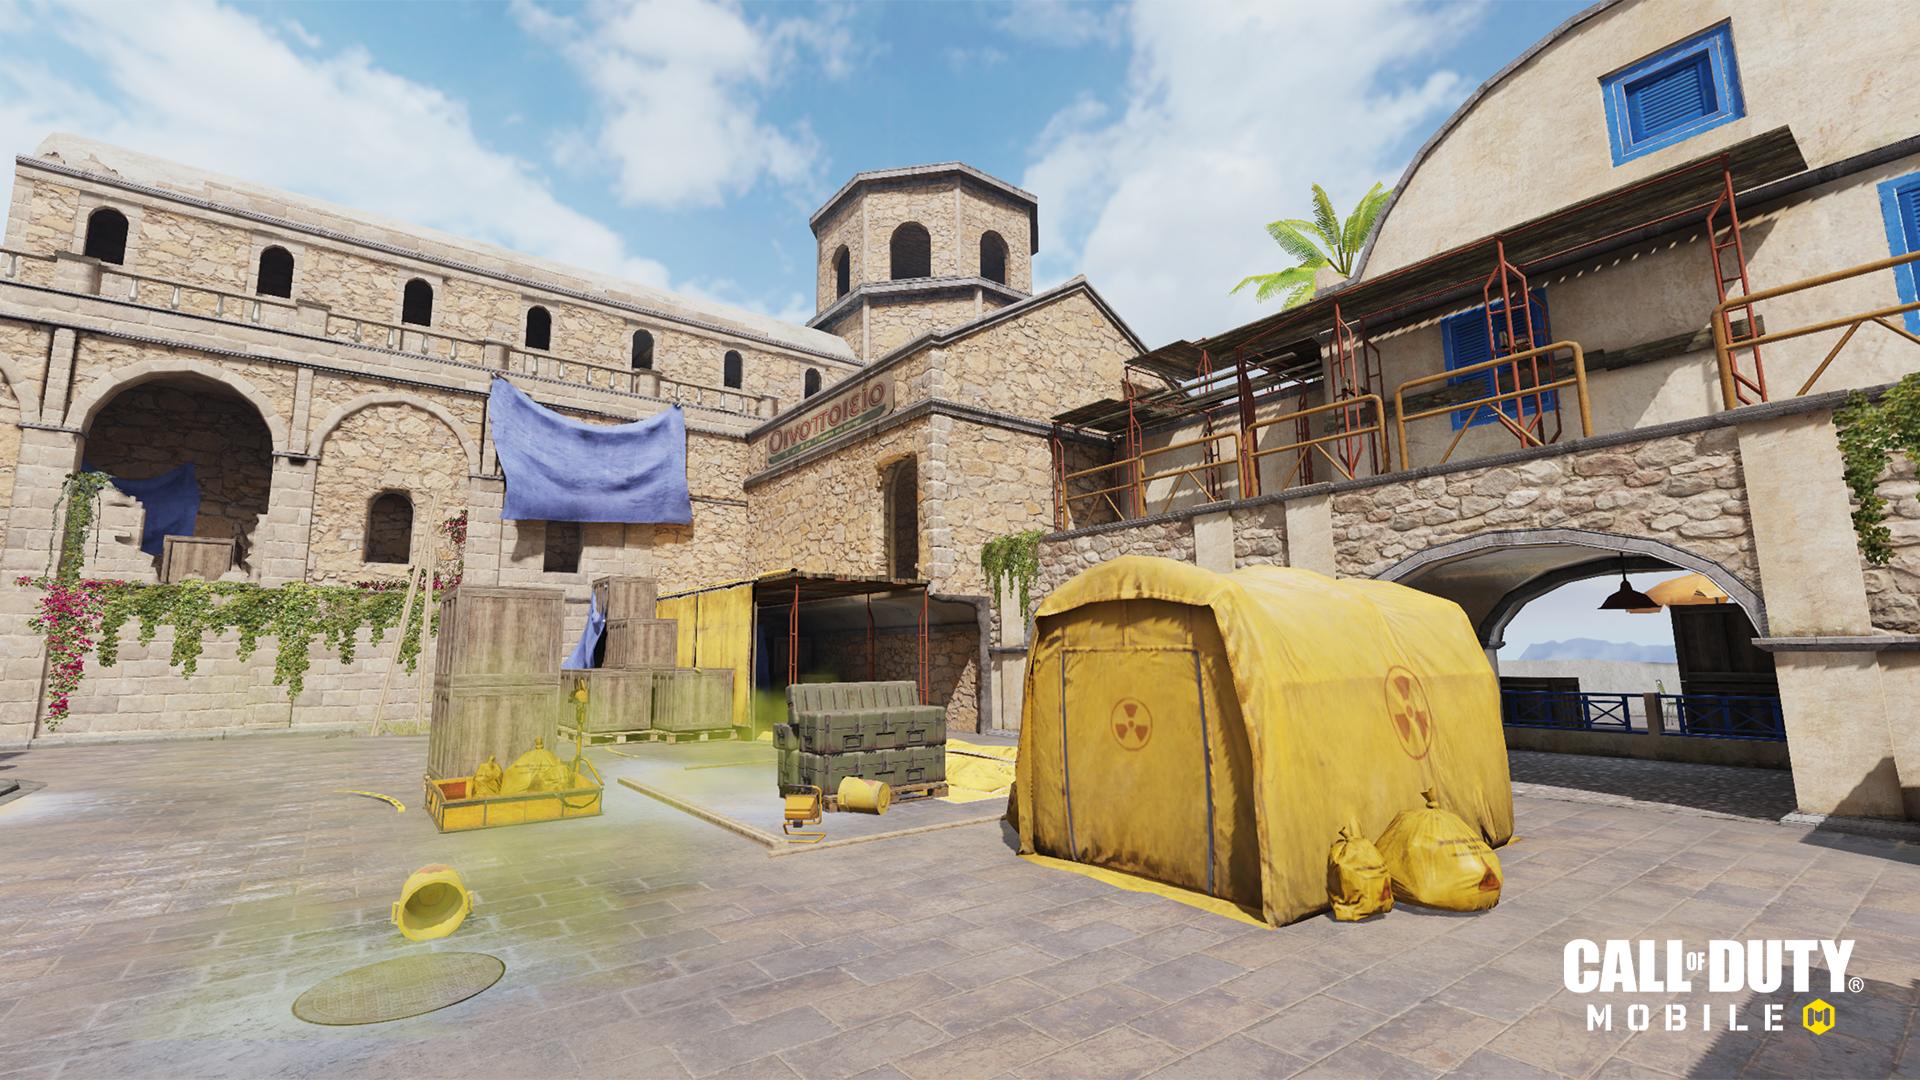 Call of Duty®: Mobile Map Snapshot: Tunisia - Image 4